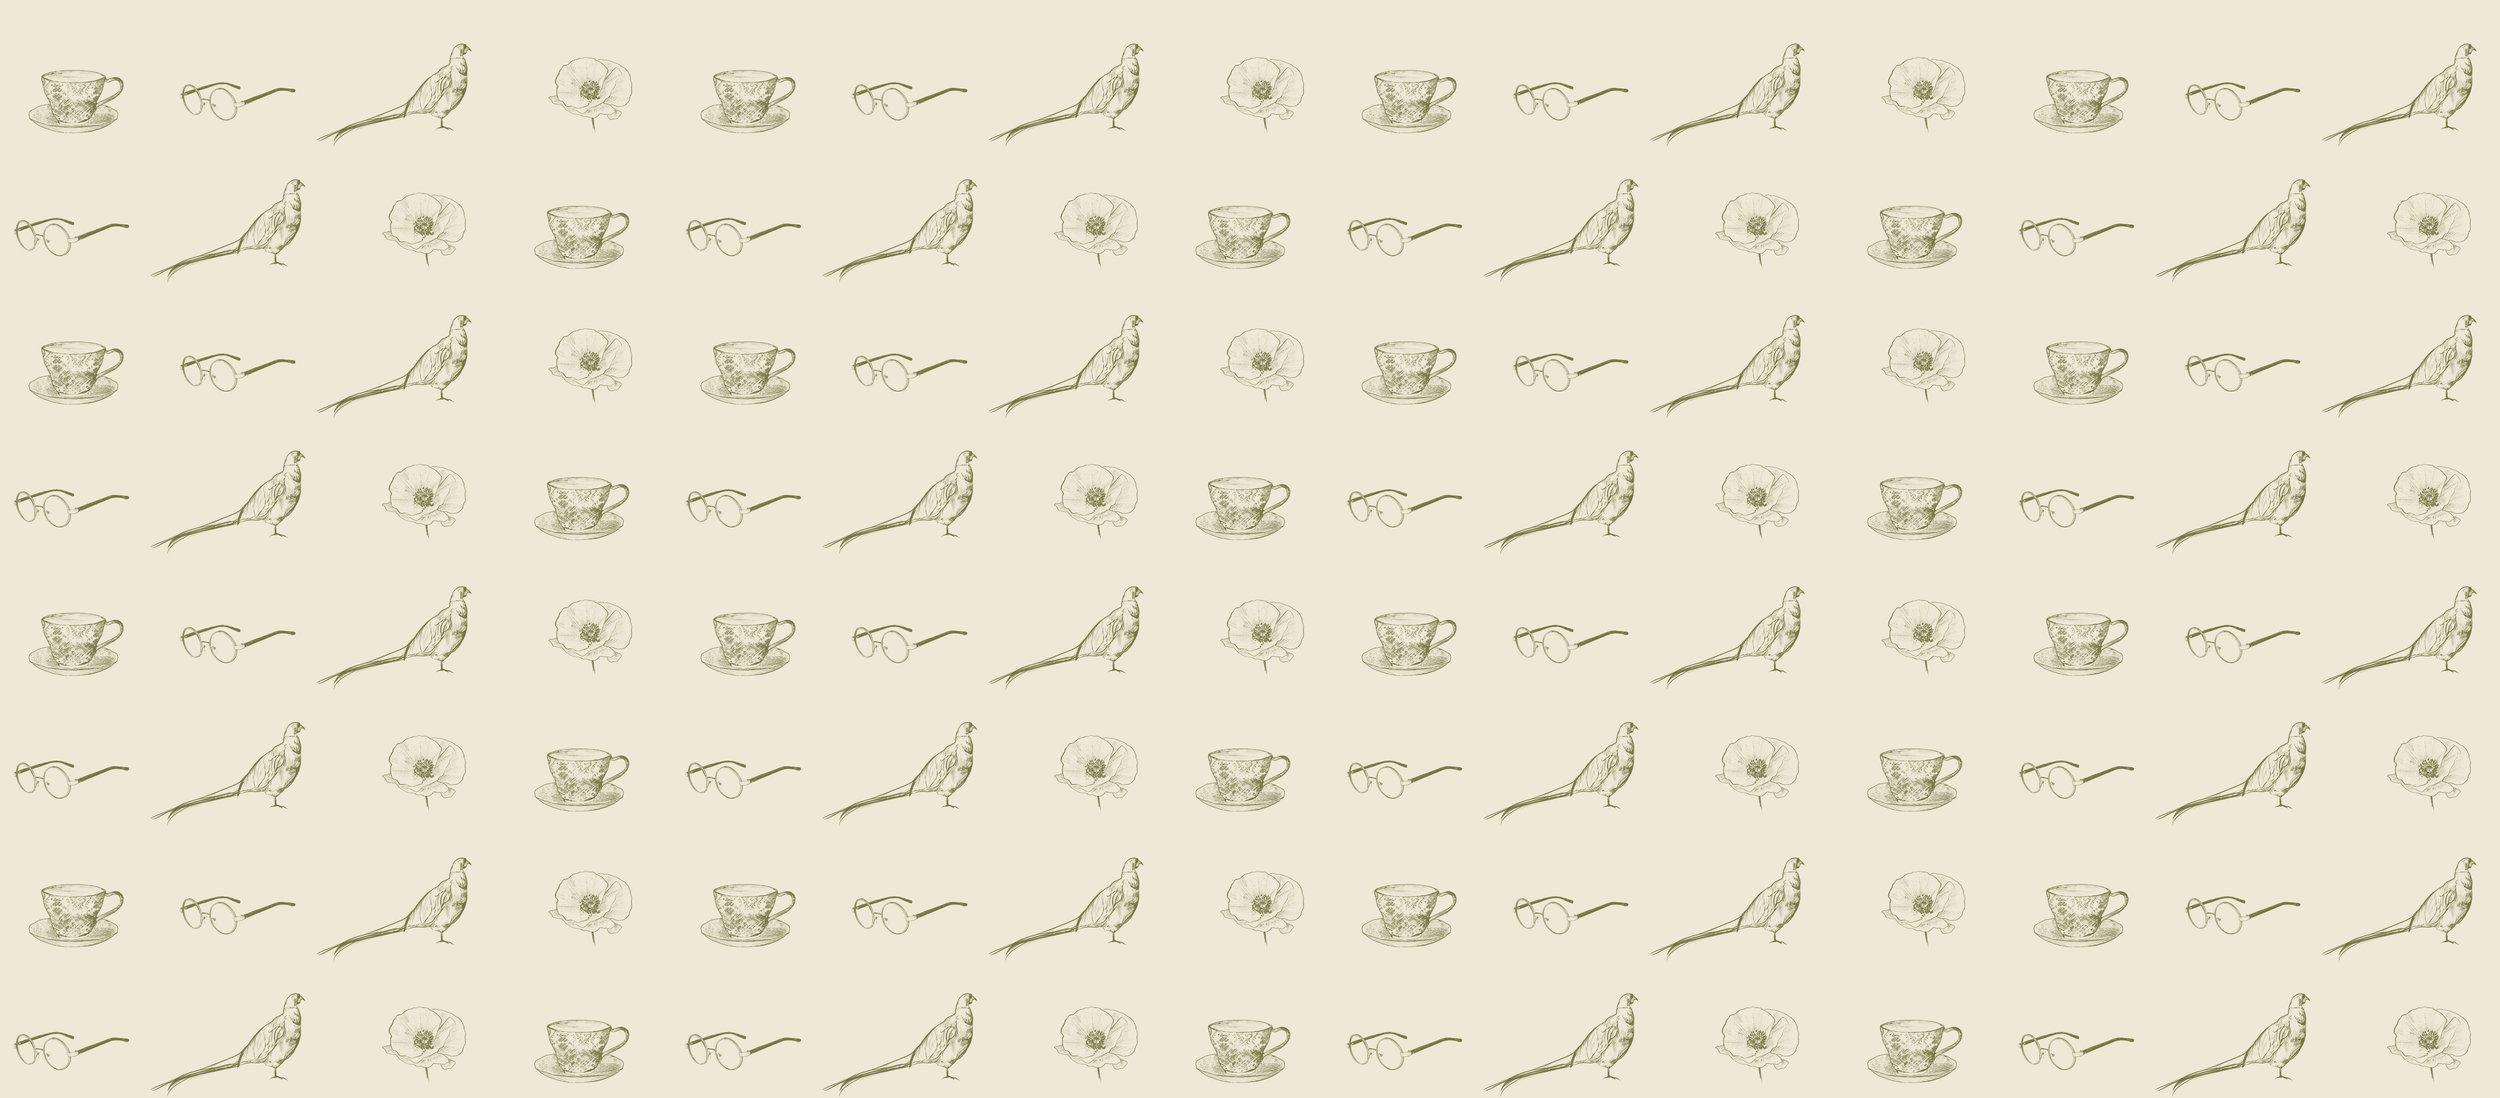 art_pattern_green-beige-background.jpg